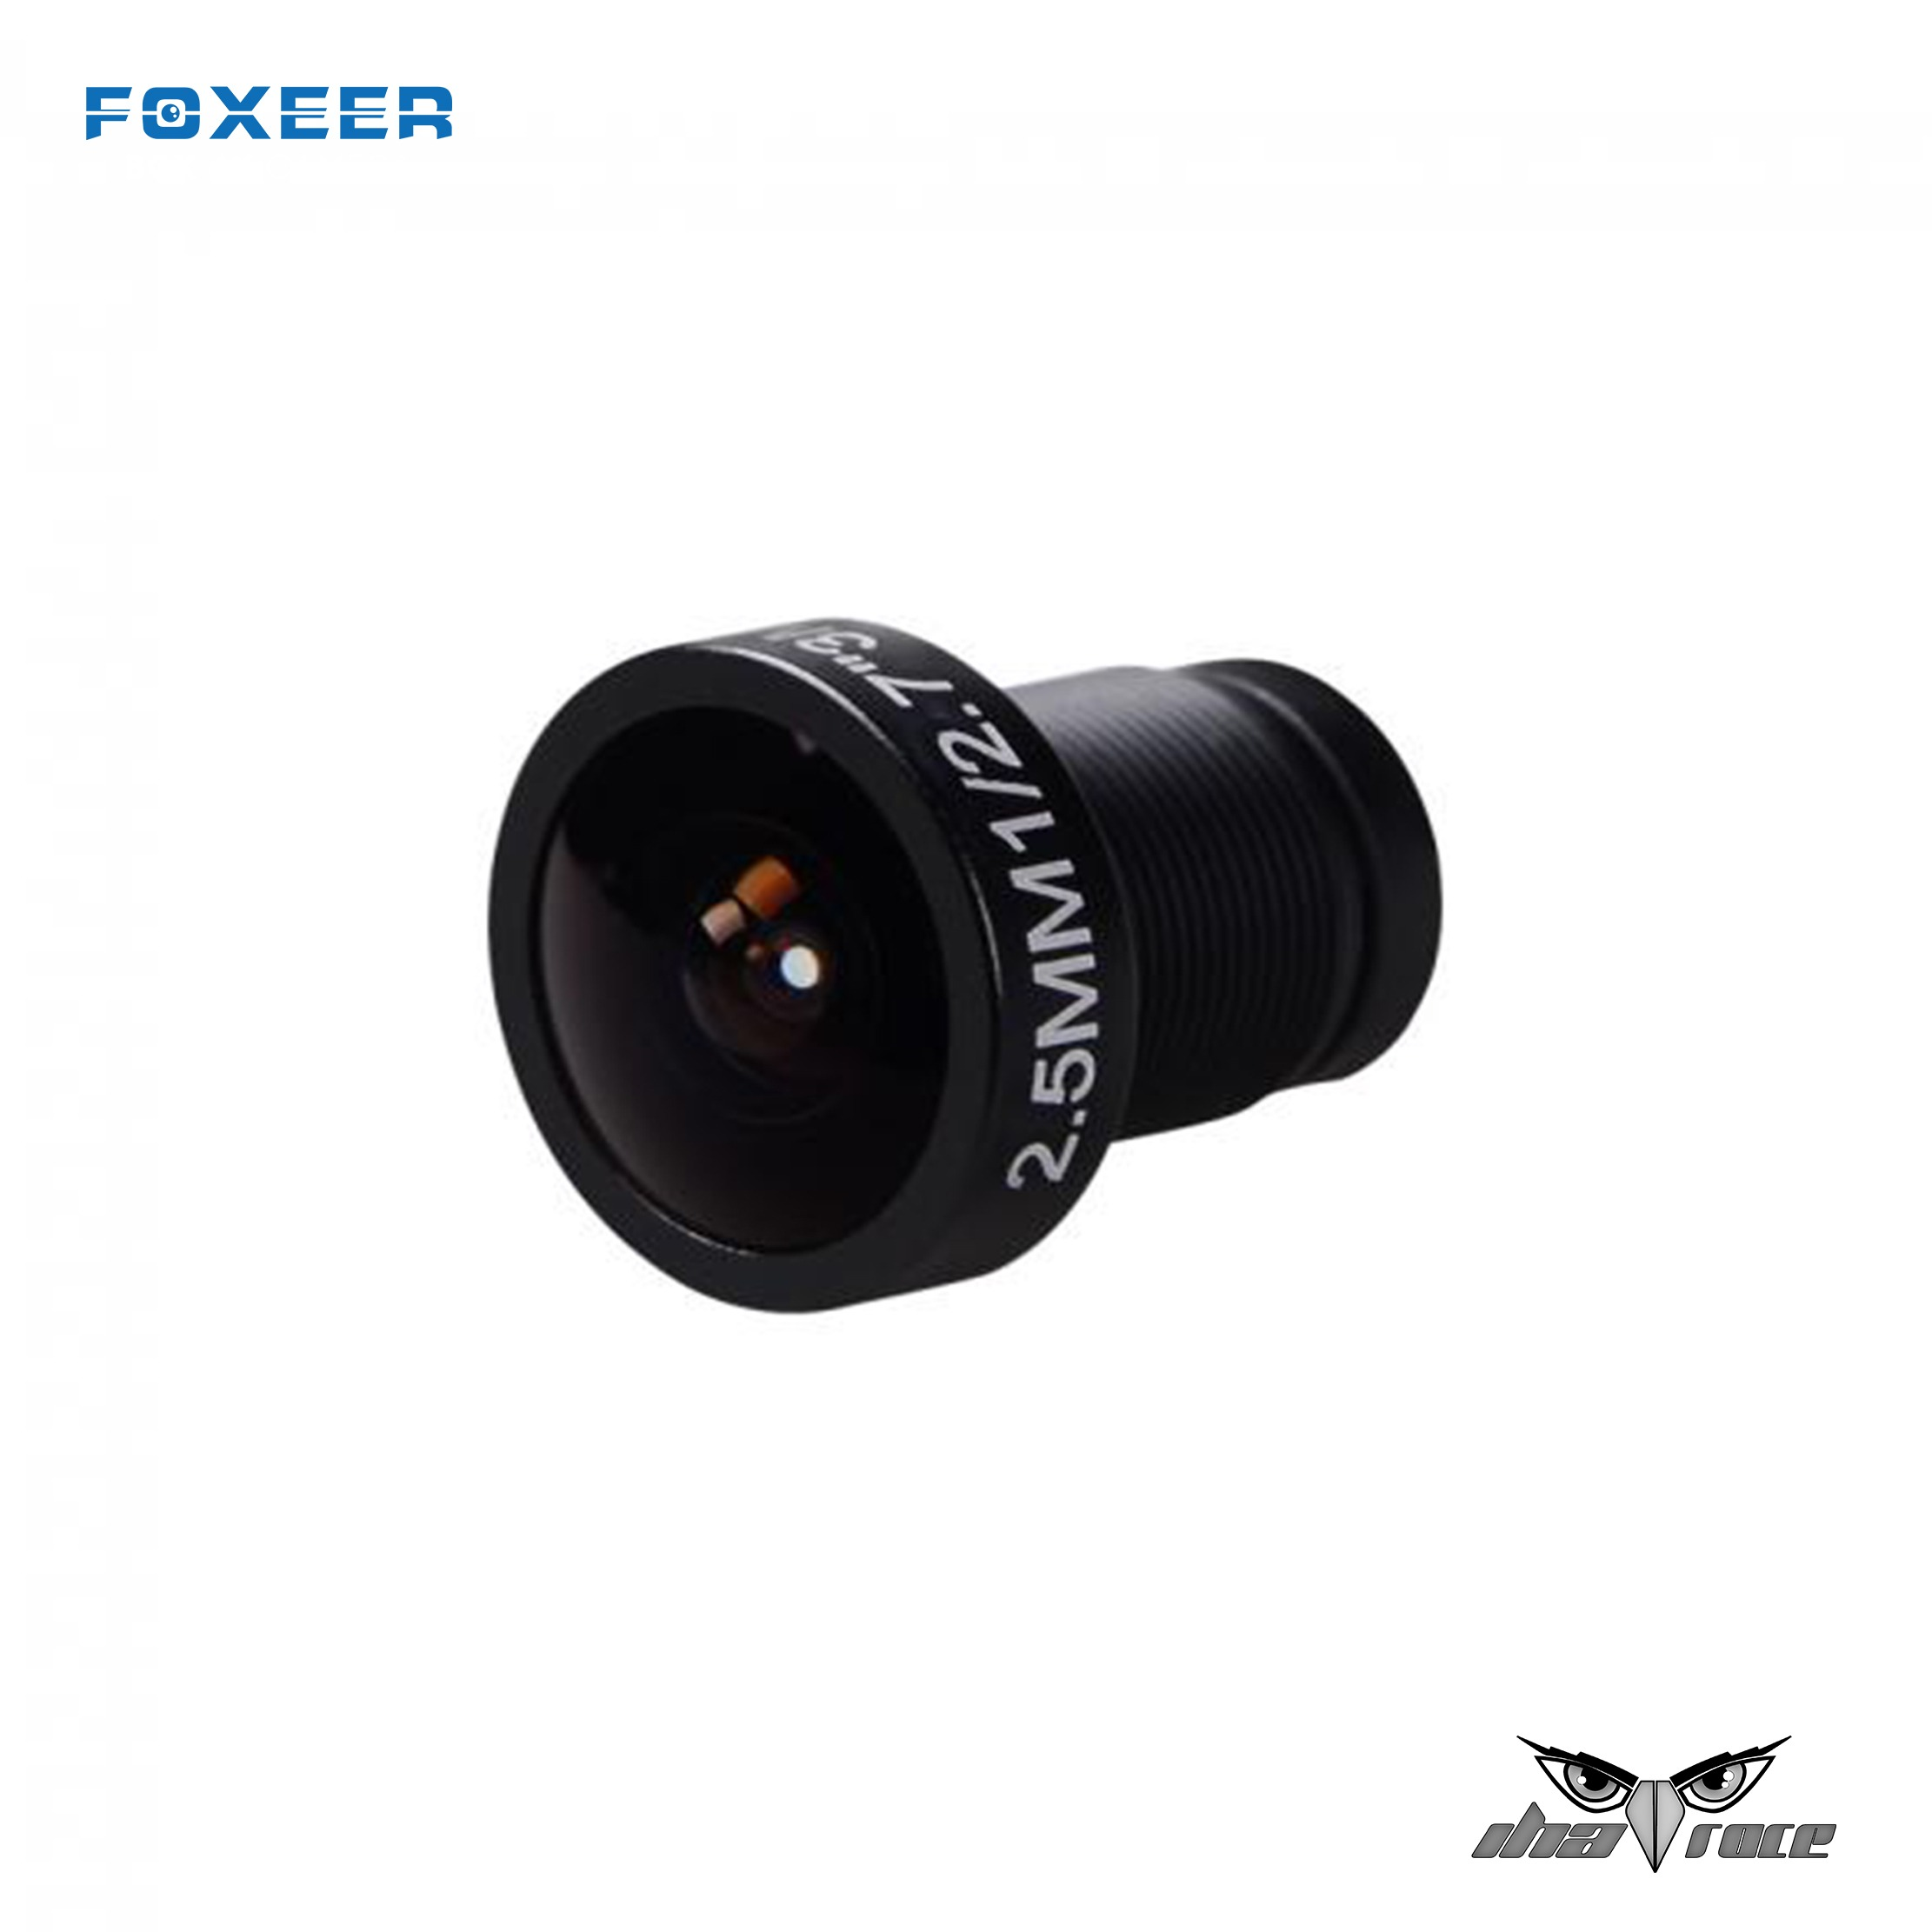 Foxeer M12 2.5mm Lentes para Arrow / Monster / Predator / Falkor Mini